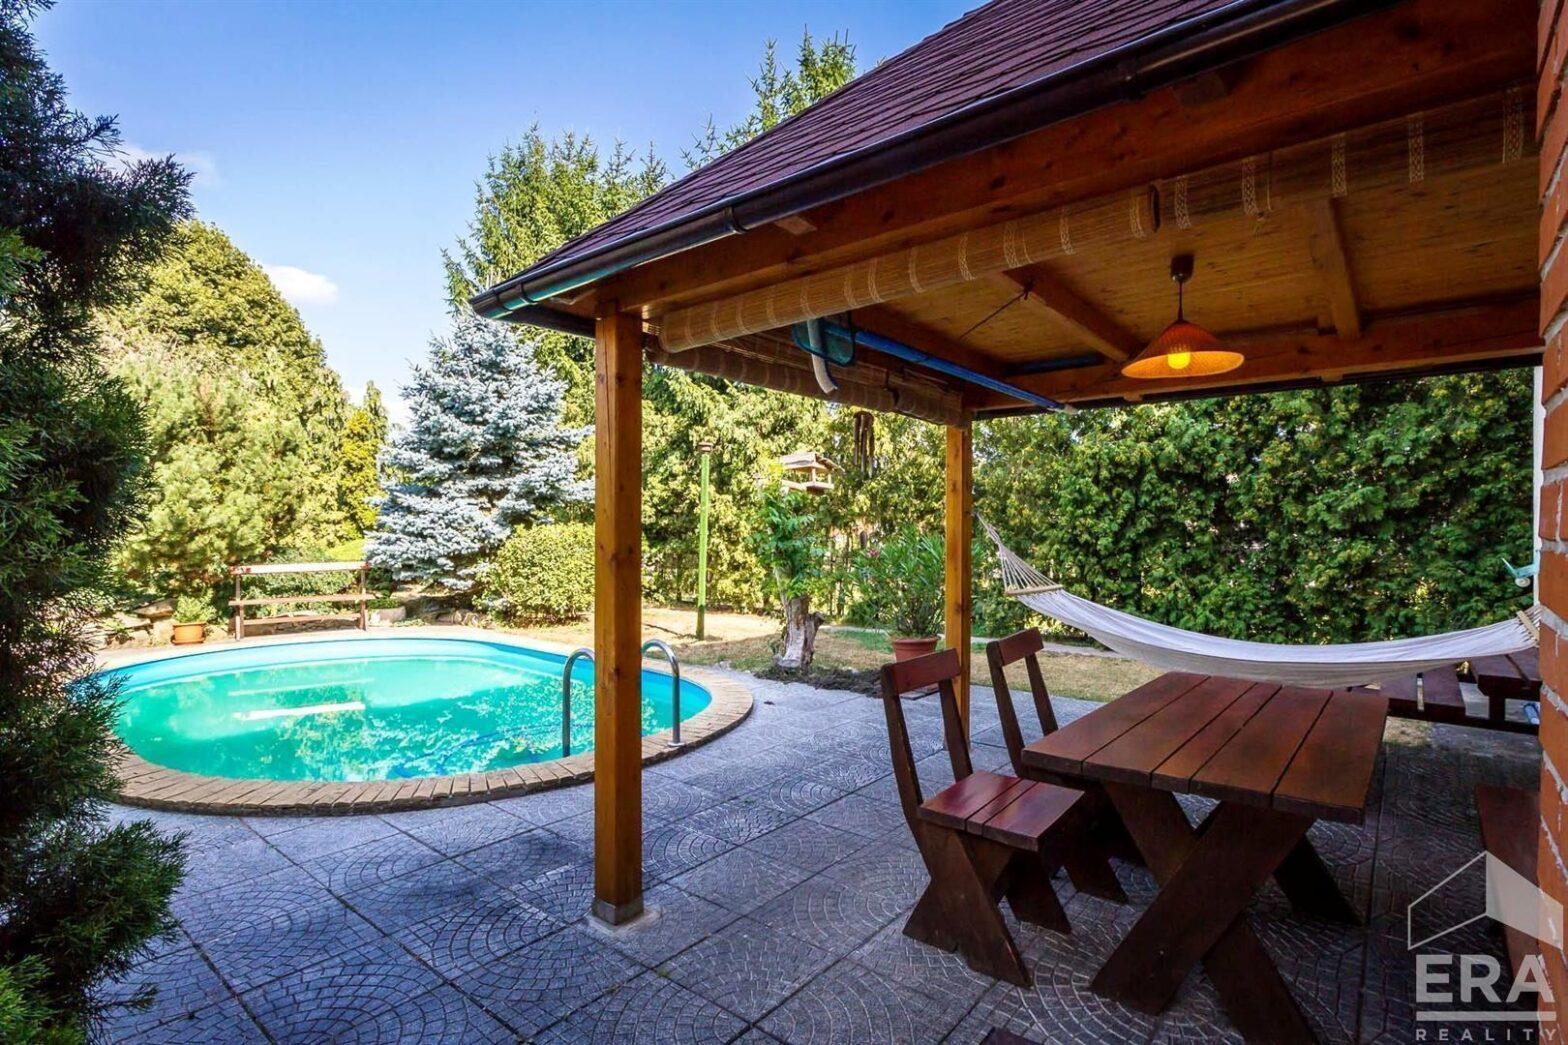 PRODÁNO – Prodej rodinného domu, Velenka oblast Kersko